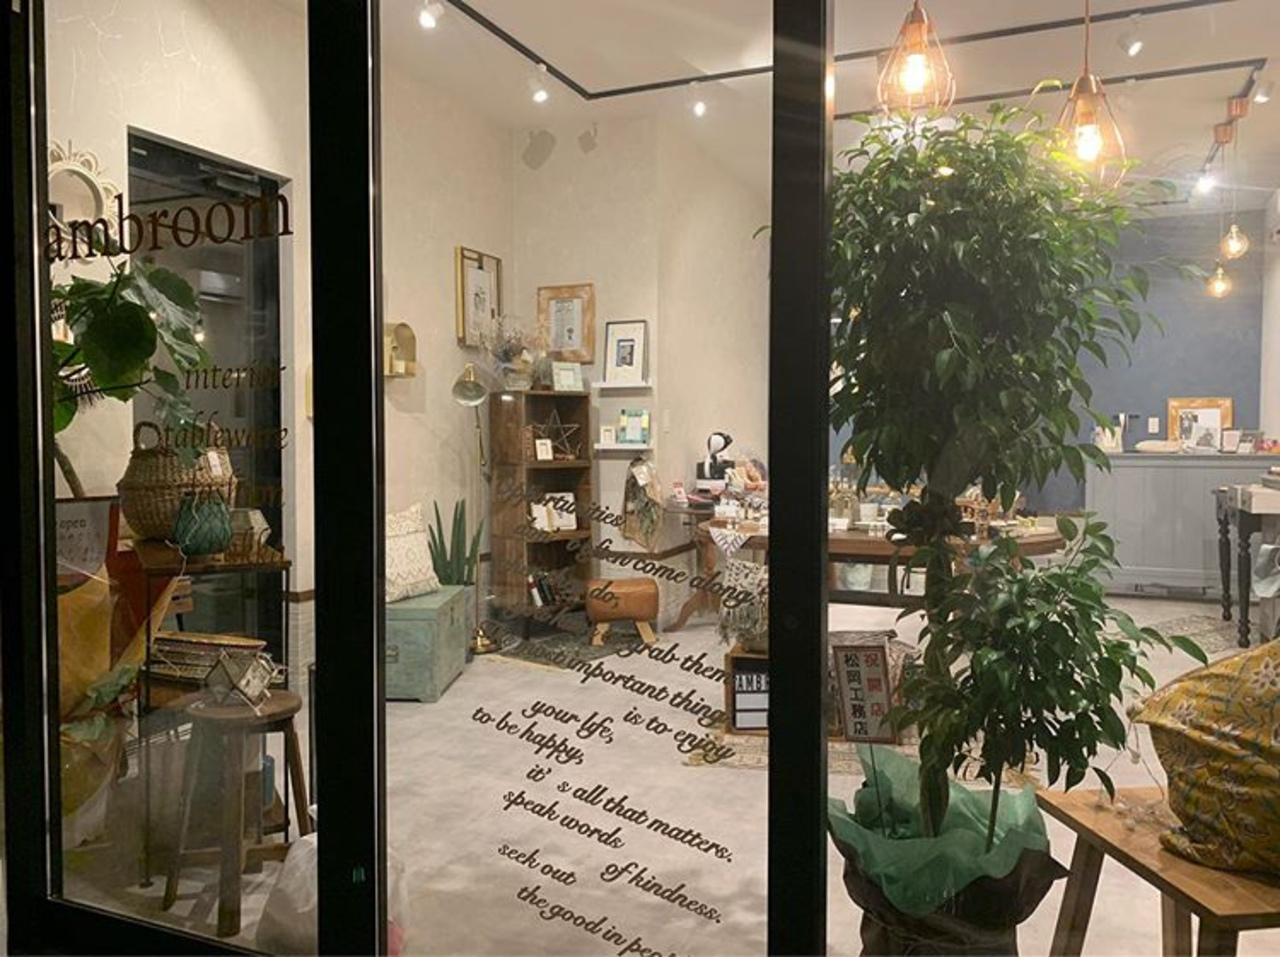 【 ambroom 】インテリア雑貨(熊本市南区)6/15オープン